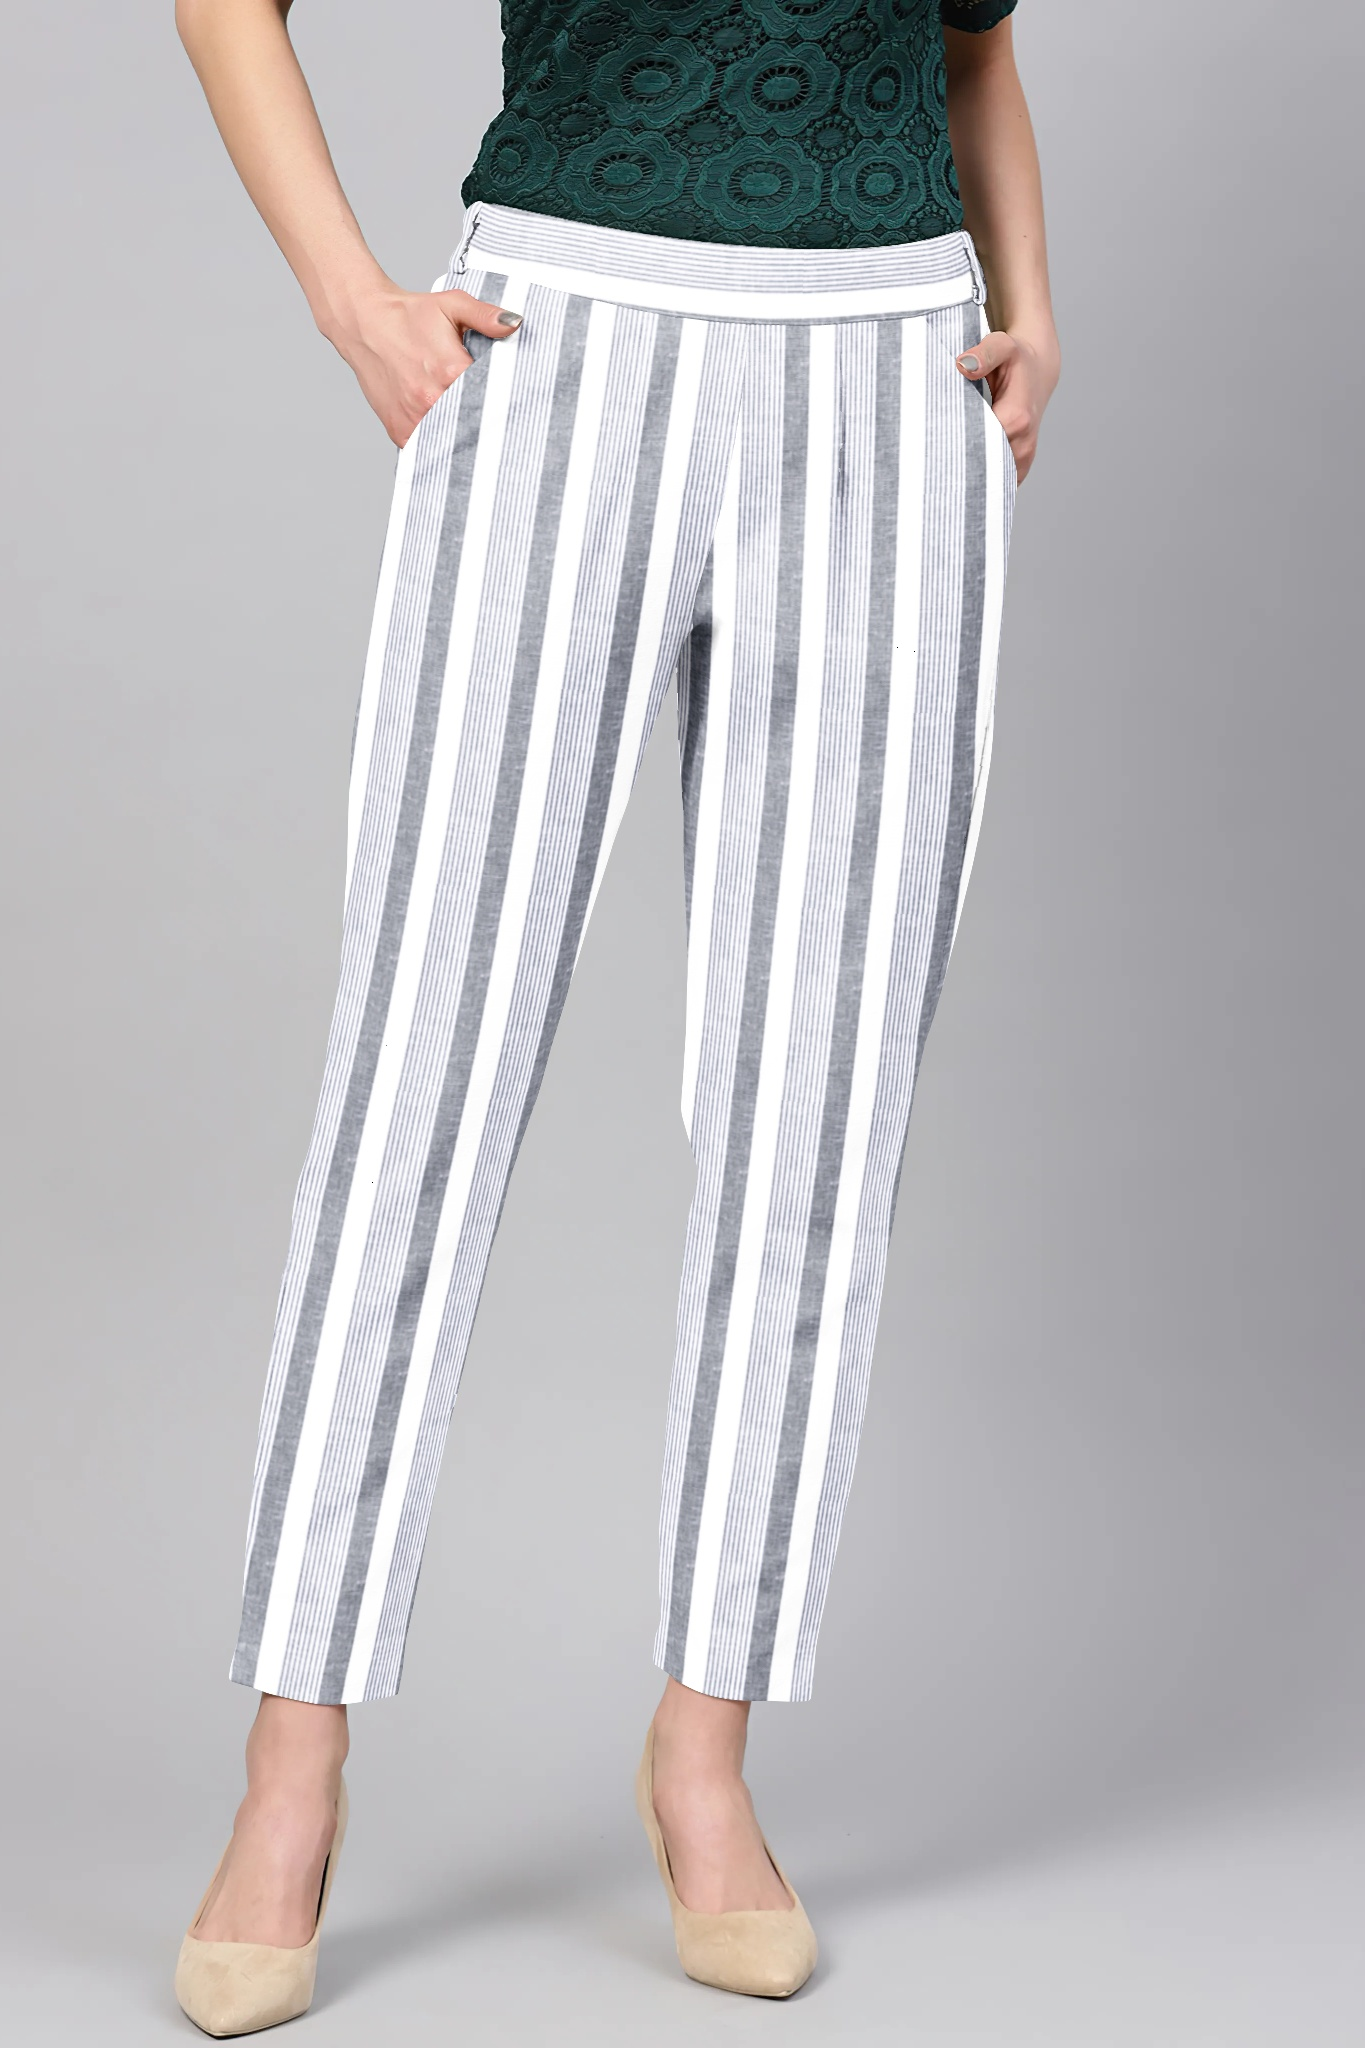 /home/customer/www/fabartcraft.com/public_html/uploadshttps://www.shopolics.com/uploads/images/medium/Gray-White-Cotton-Stripe-Regular-Fit-Solid-Trouser-36087.jpg